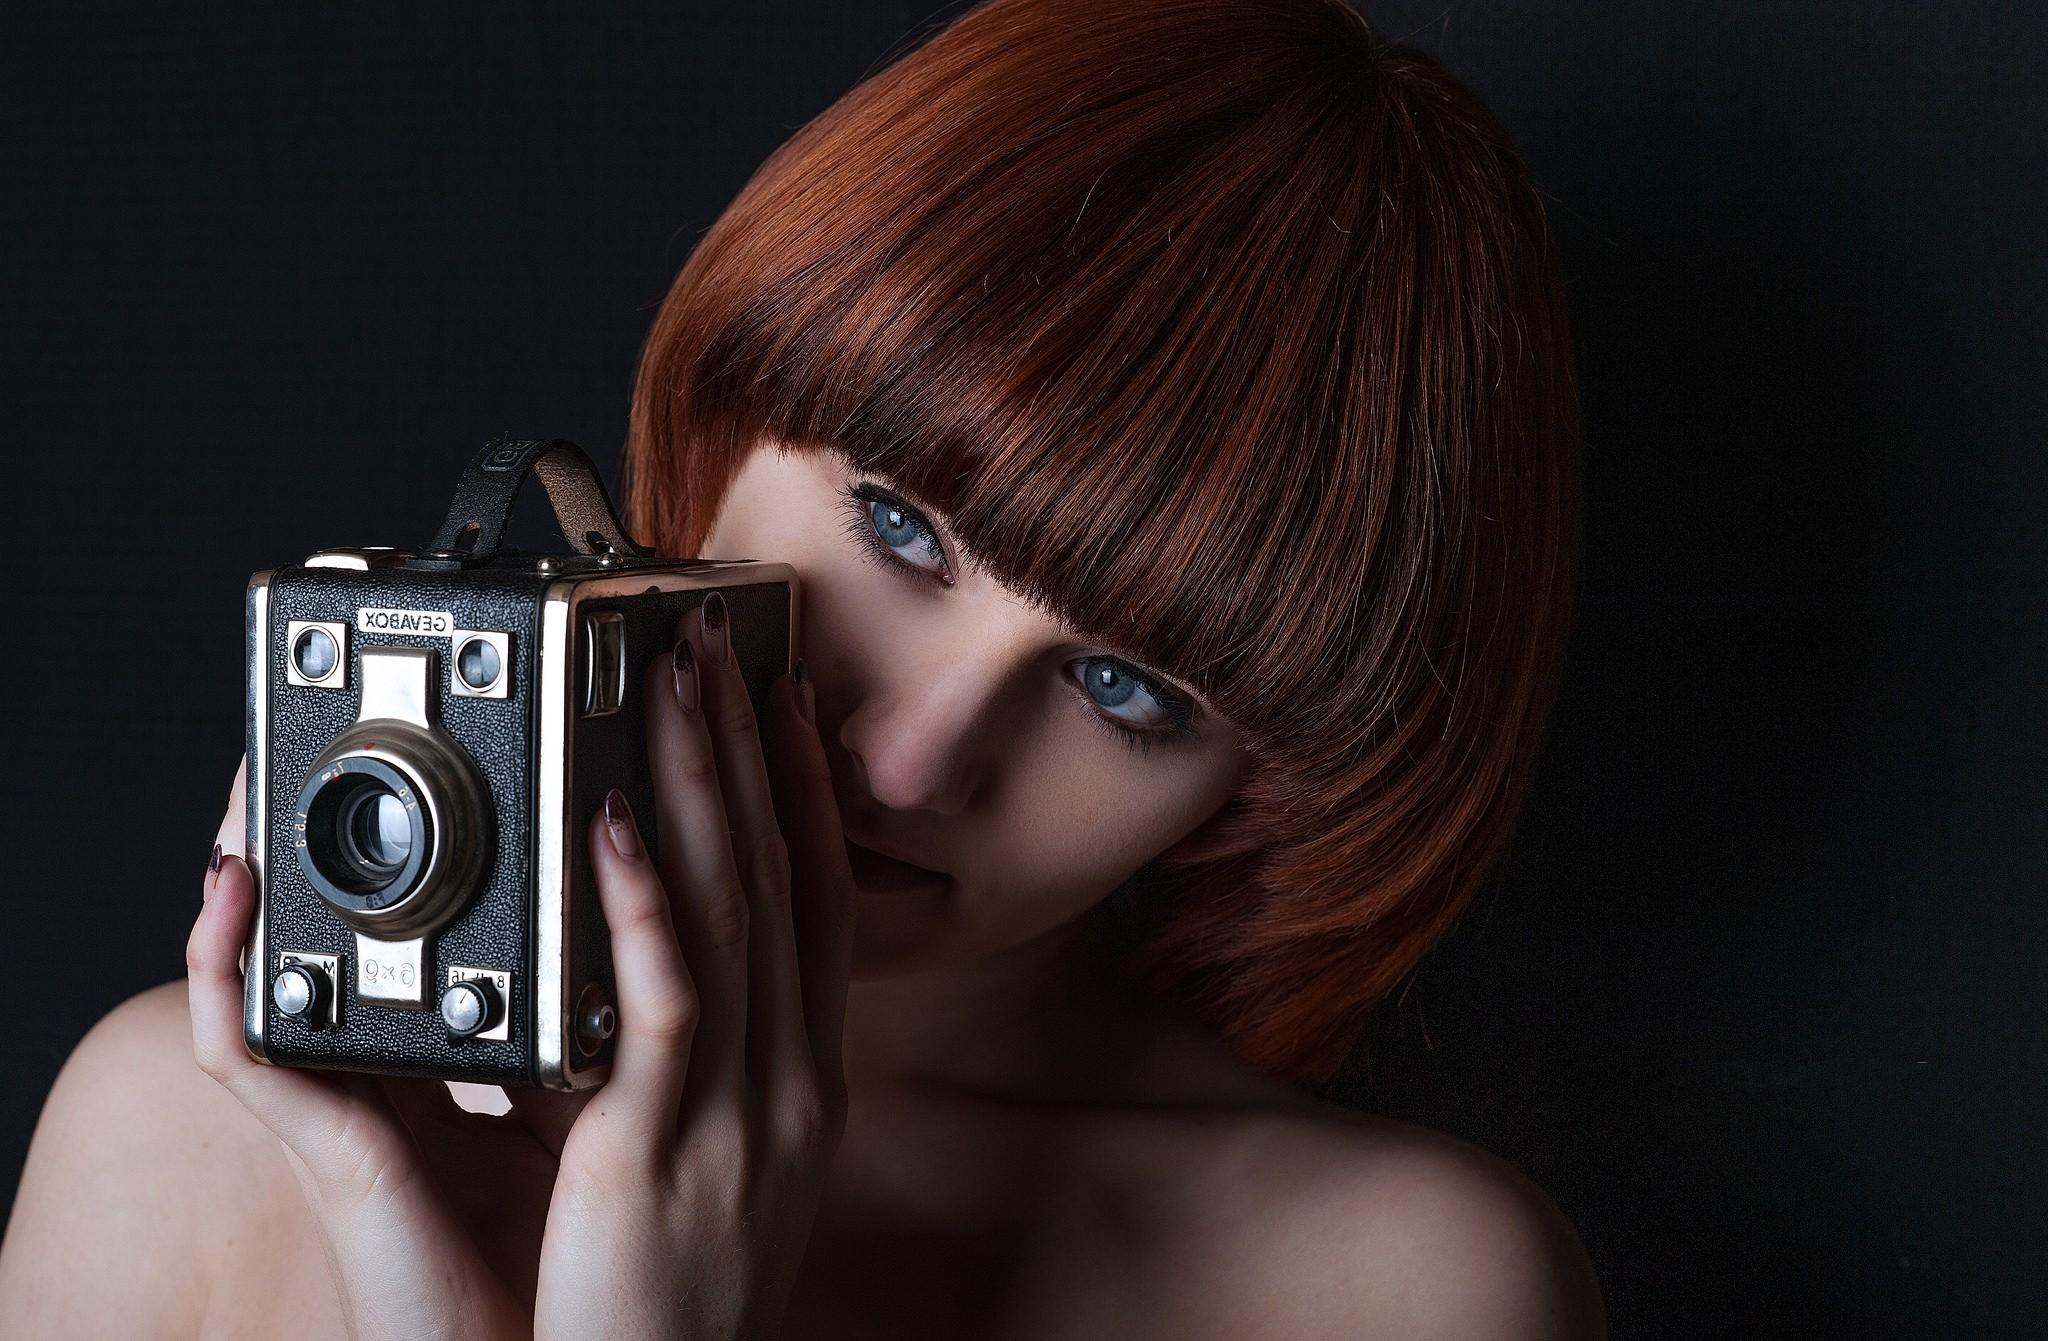 Wallpaper Menghadapi Hitam Wanita Si Rambut Merah Model Biru